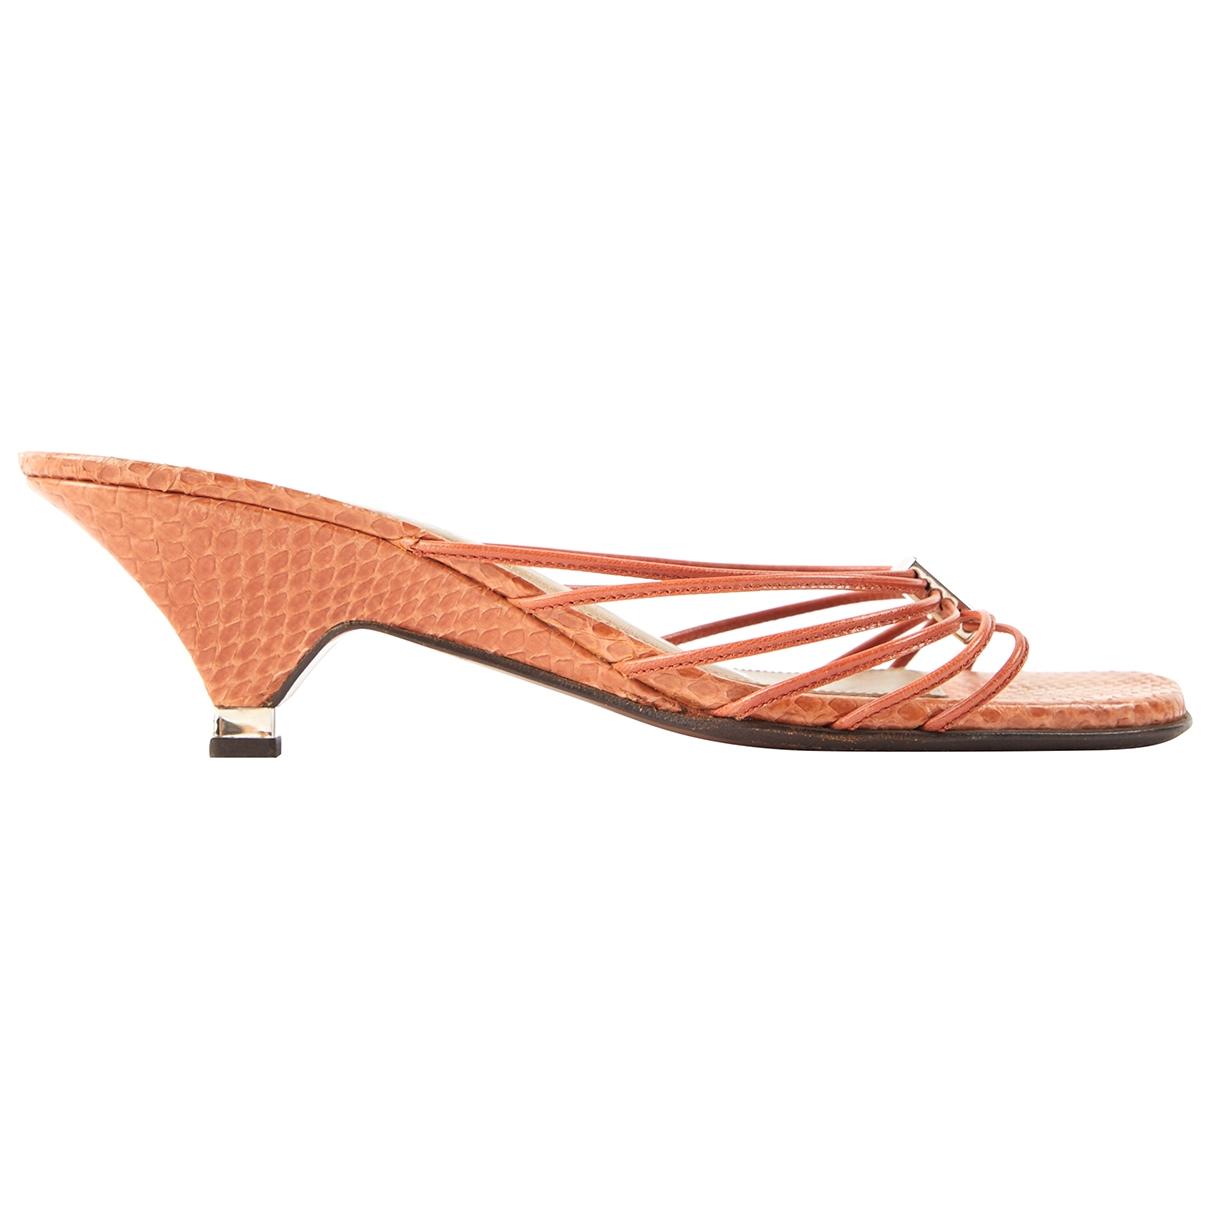 Sandalias romanas de Piton Louis Vuitton